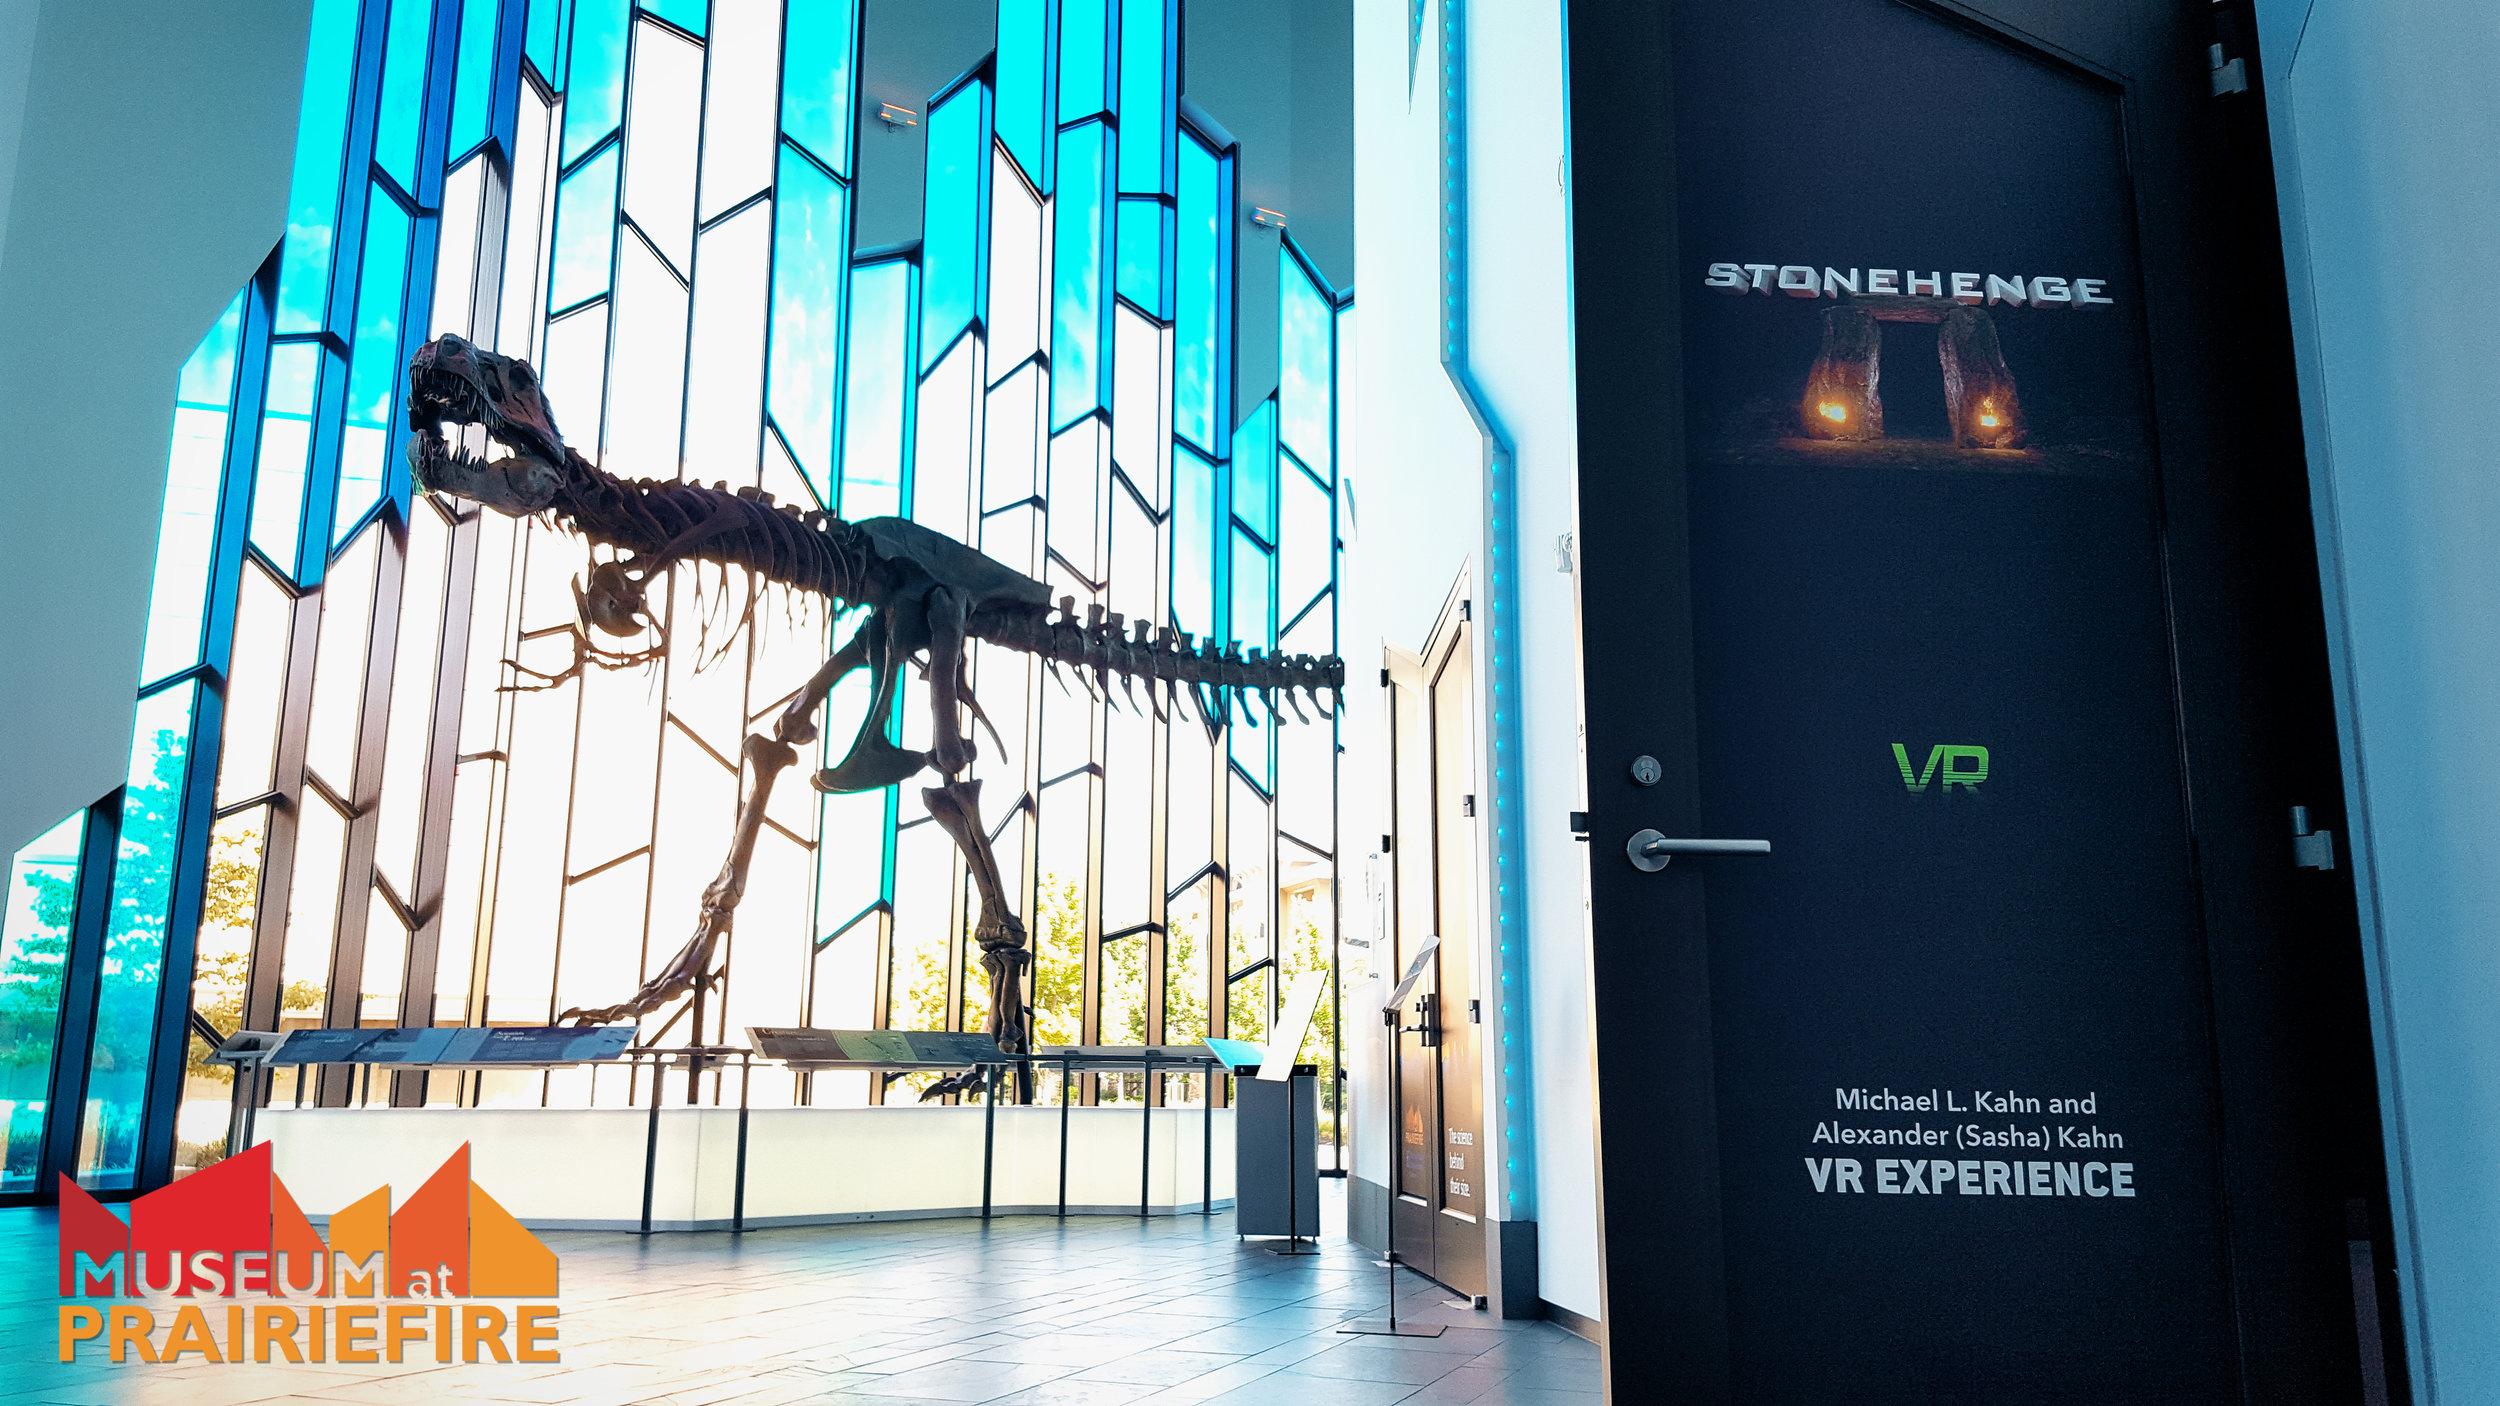 Stonehenge VR SANDBOX_SS_Museum at Prairiefire_01.jpg